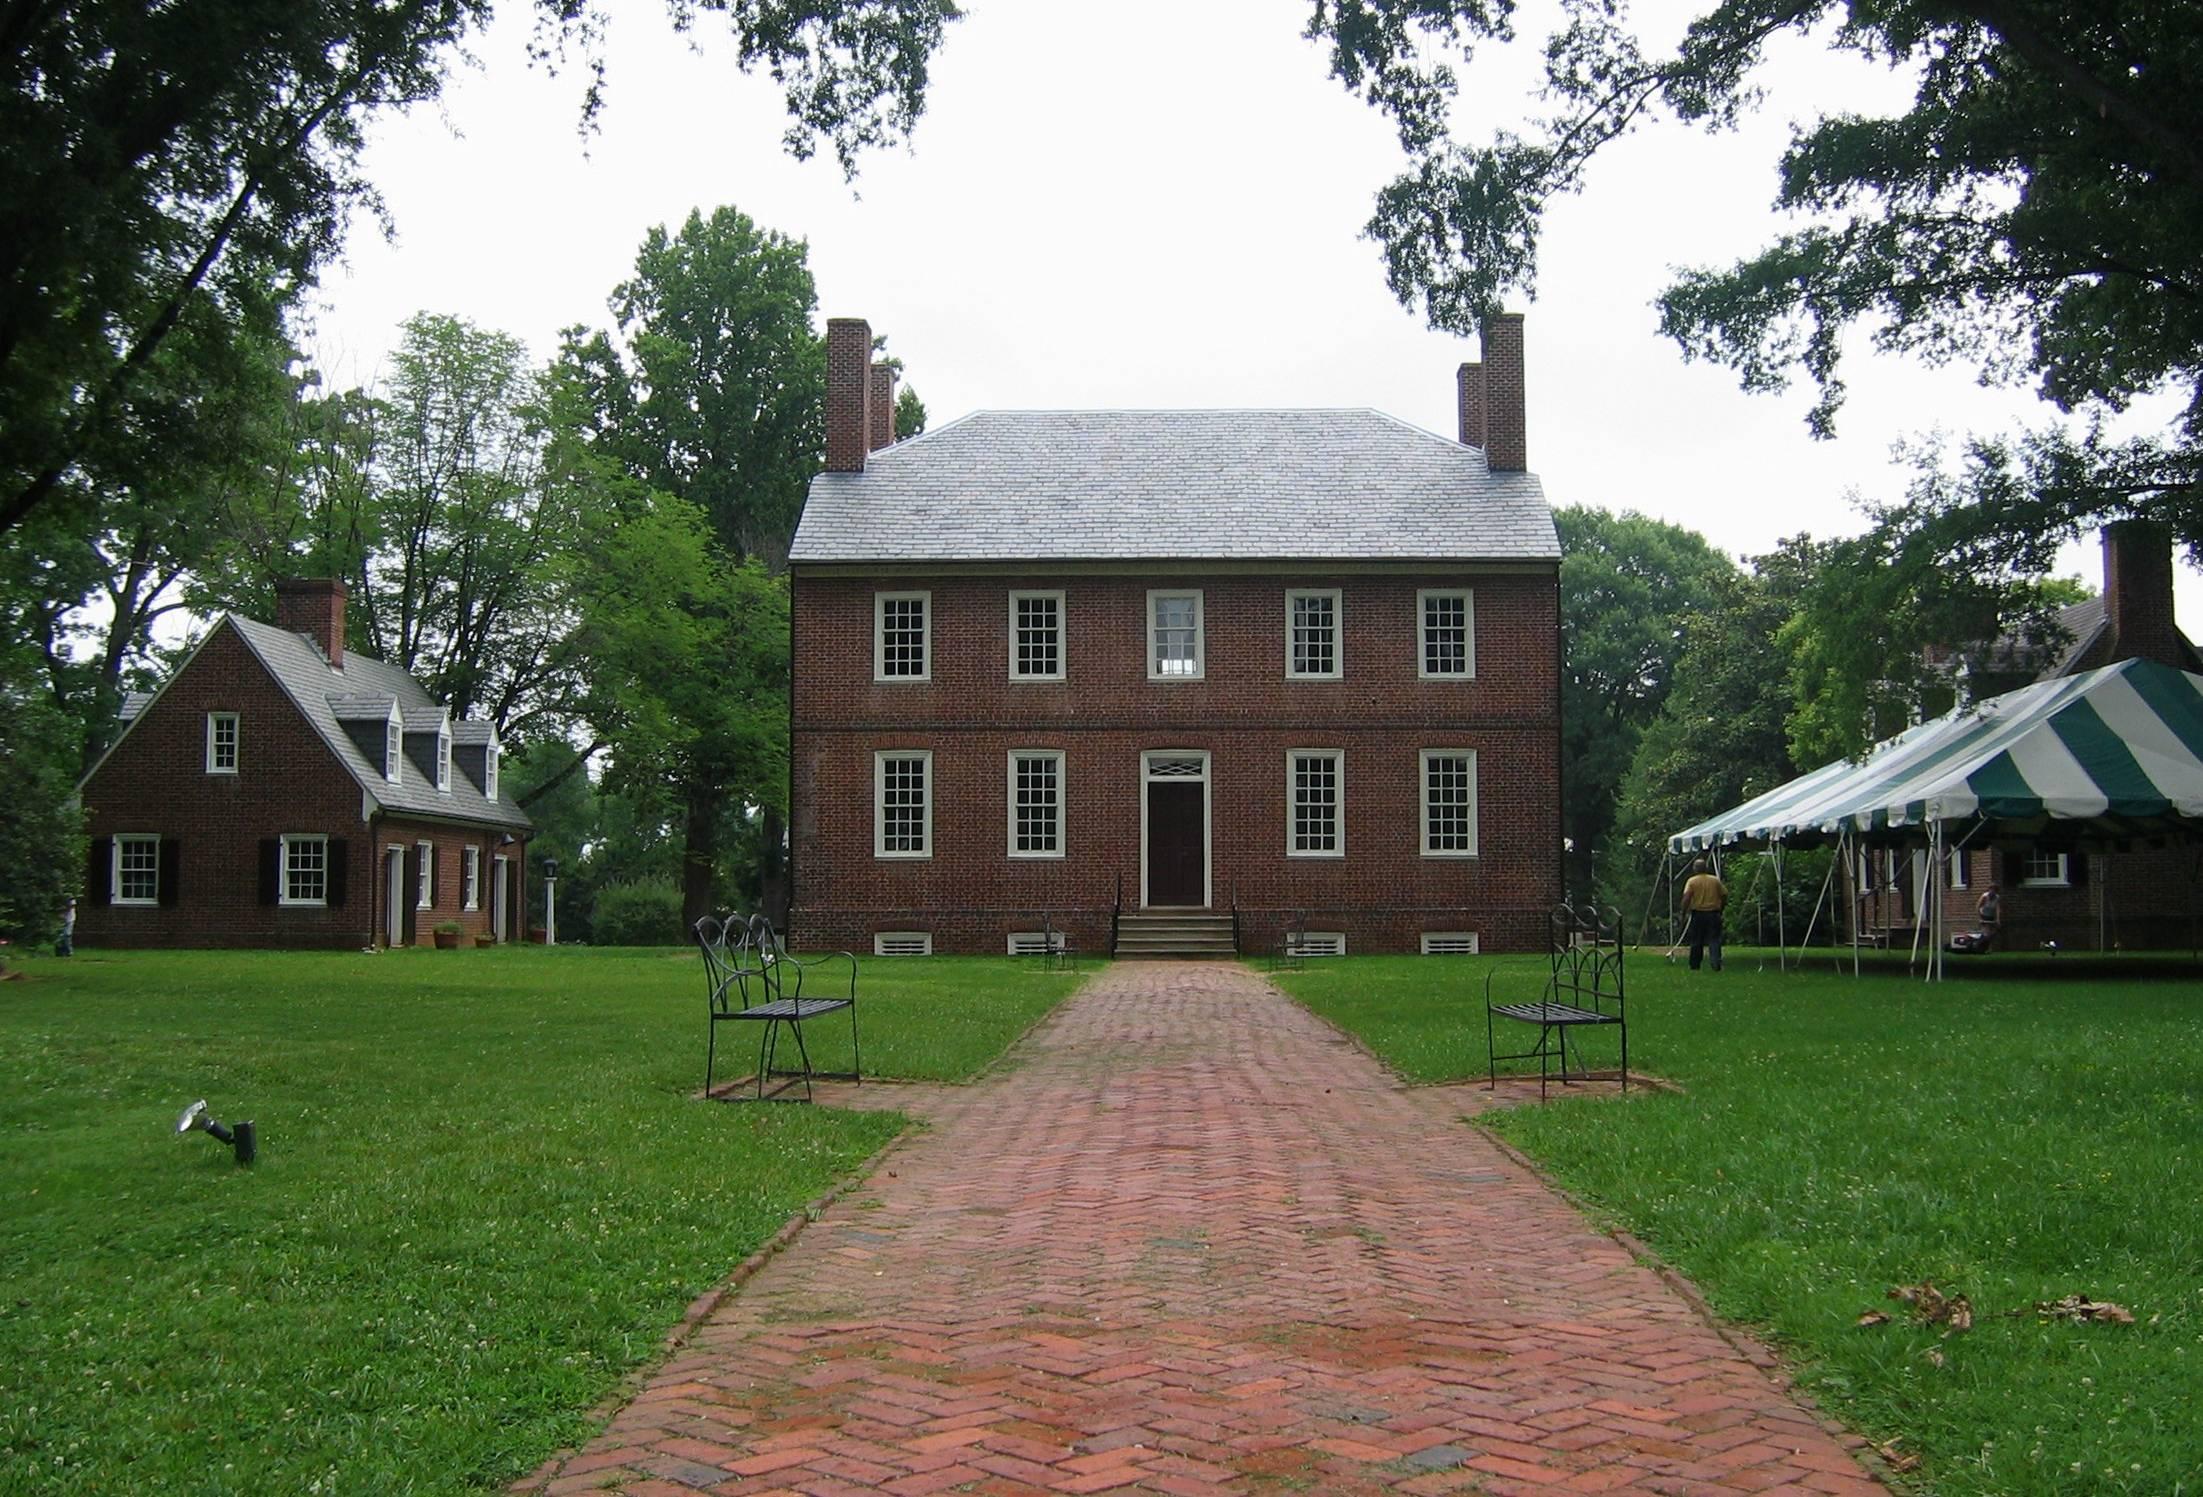 Kenmore Plantation in Fredericksburg, Virginia